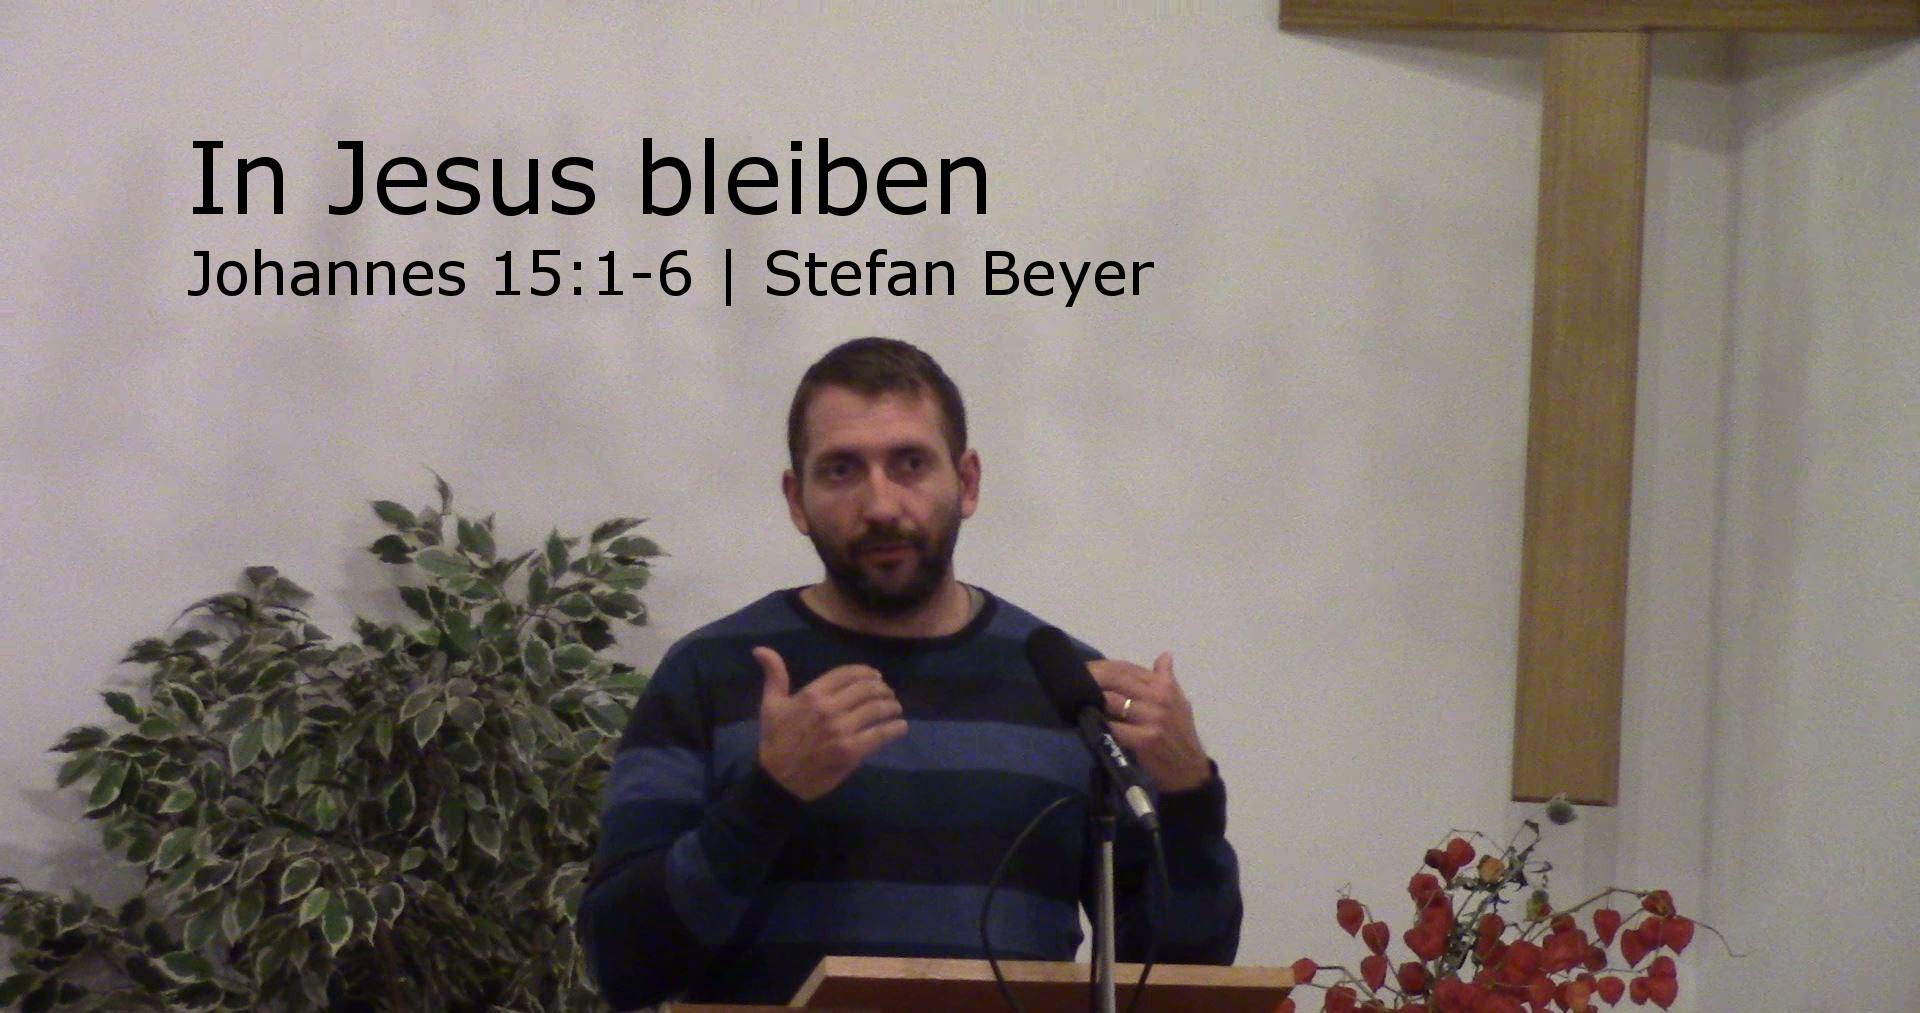 Johannes 15:1-6 – In Jesus bleiben